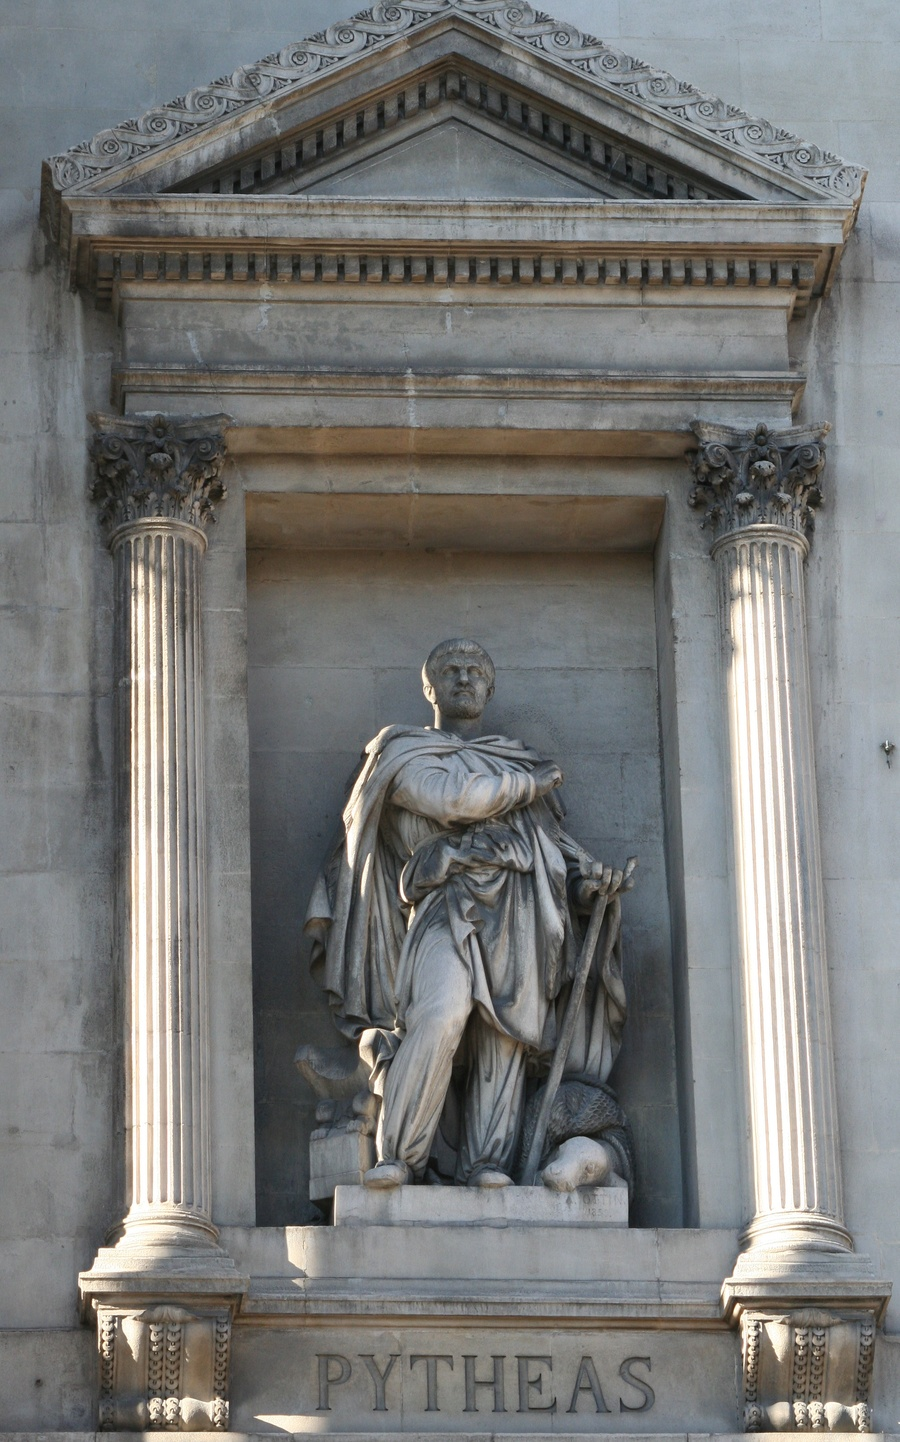 Figure 13: Statue Of Pytheas, Erected At The Palais De La Bourse In  Marseille In Honour Of His Achievements (credit: Rvalette,